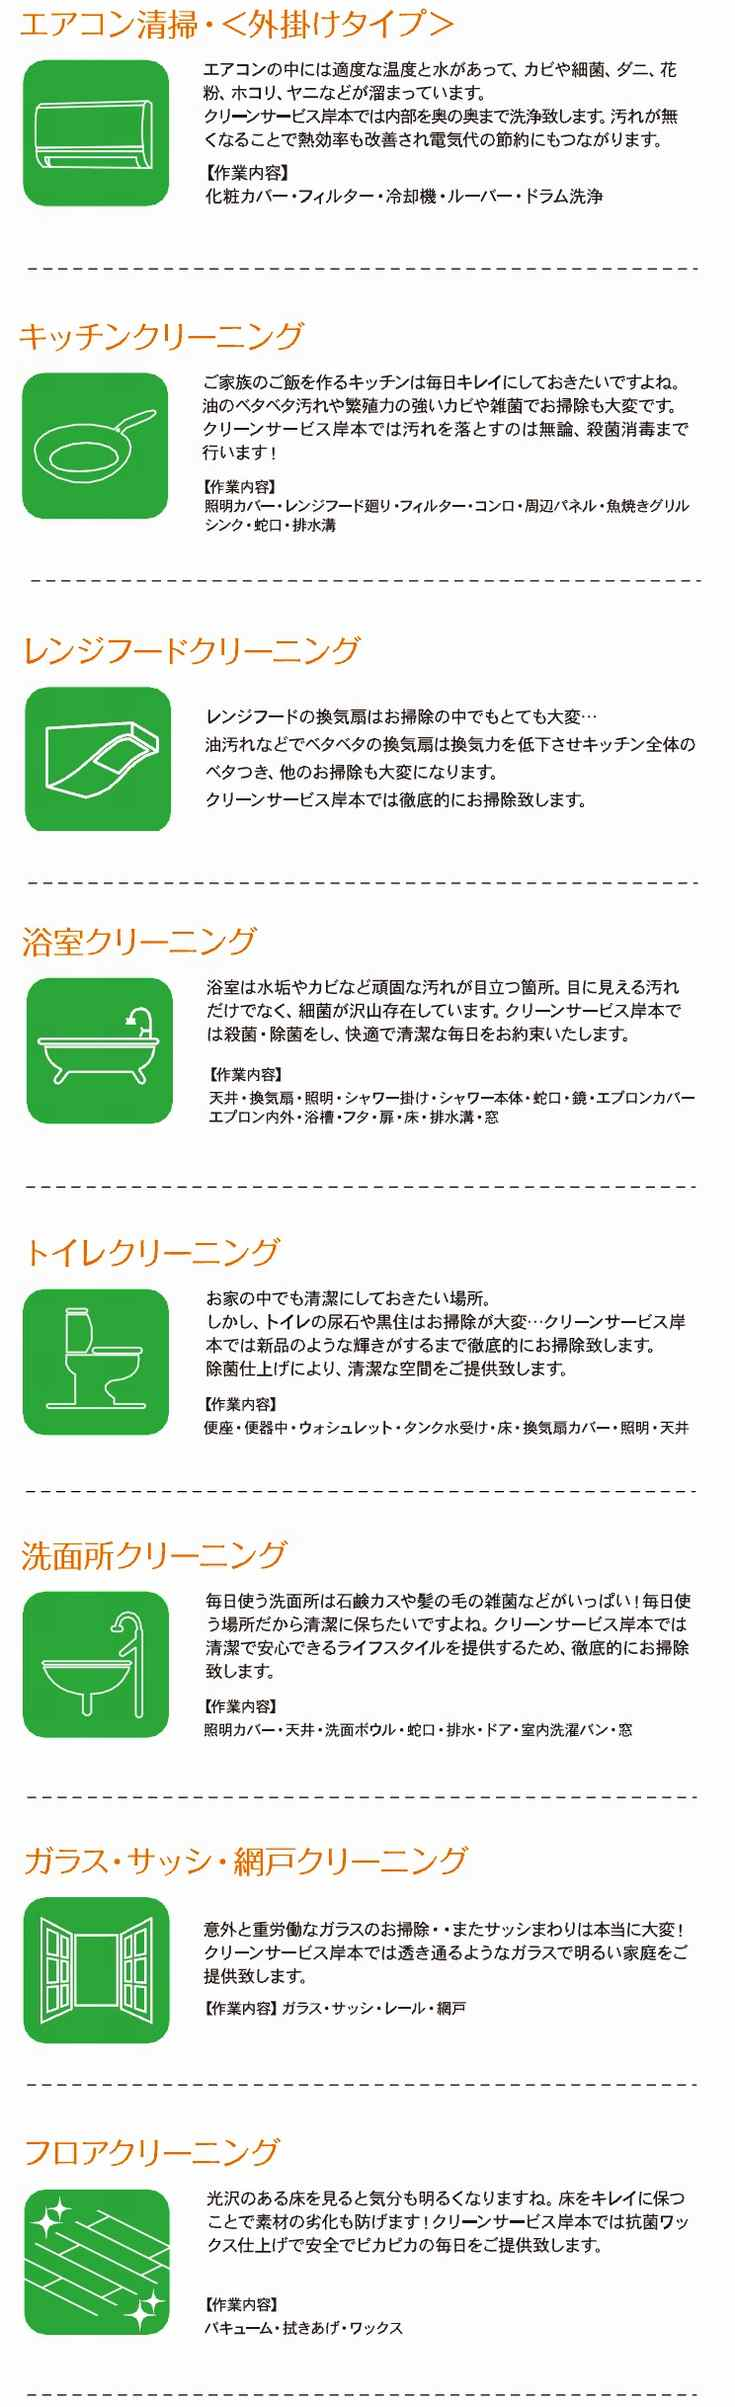 kishimoto_pac_2.jpg